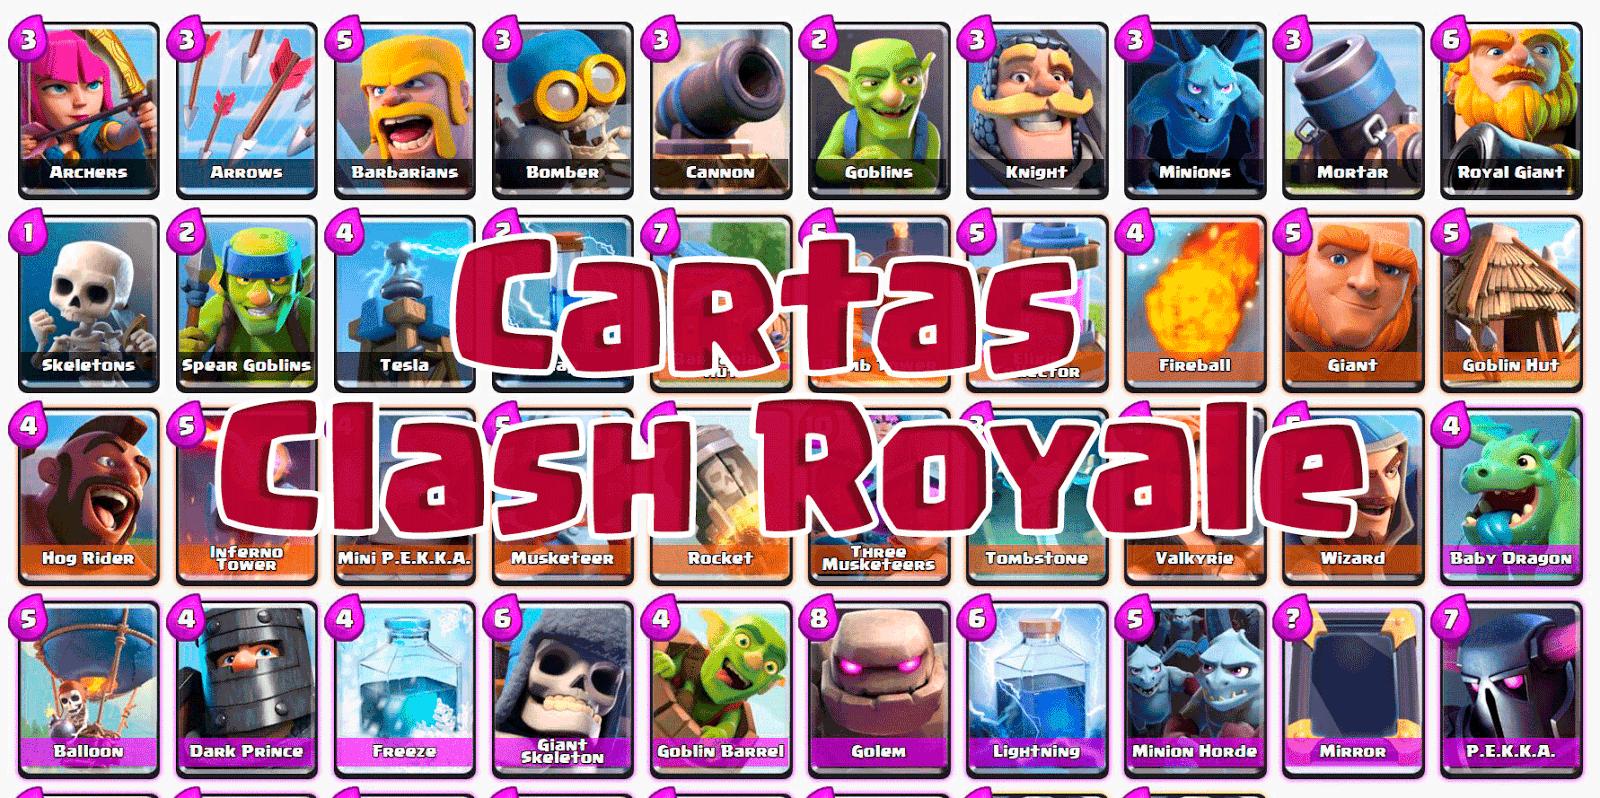 Clash Royale: Cartas De Clash Royale